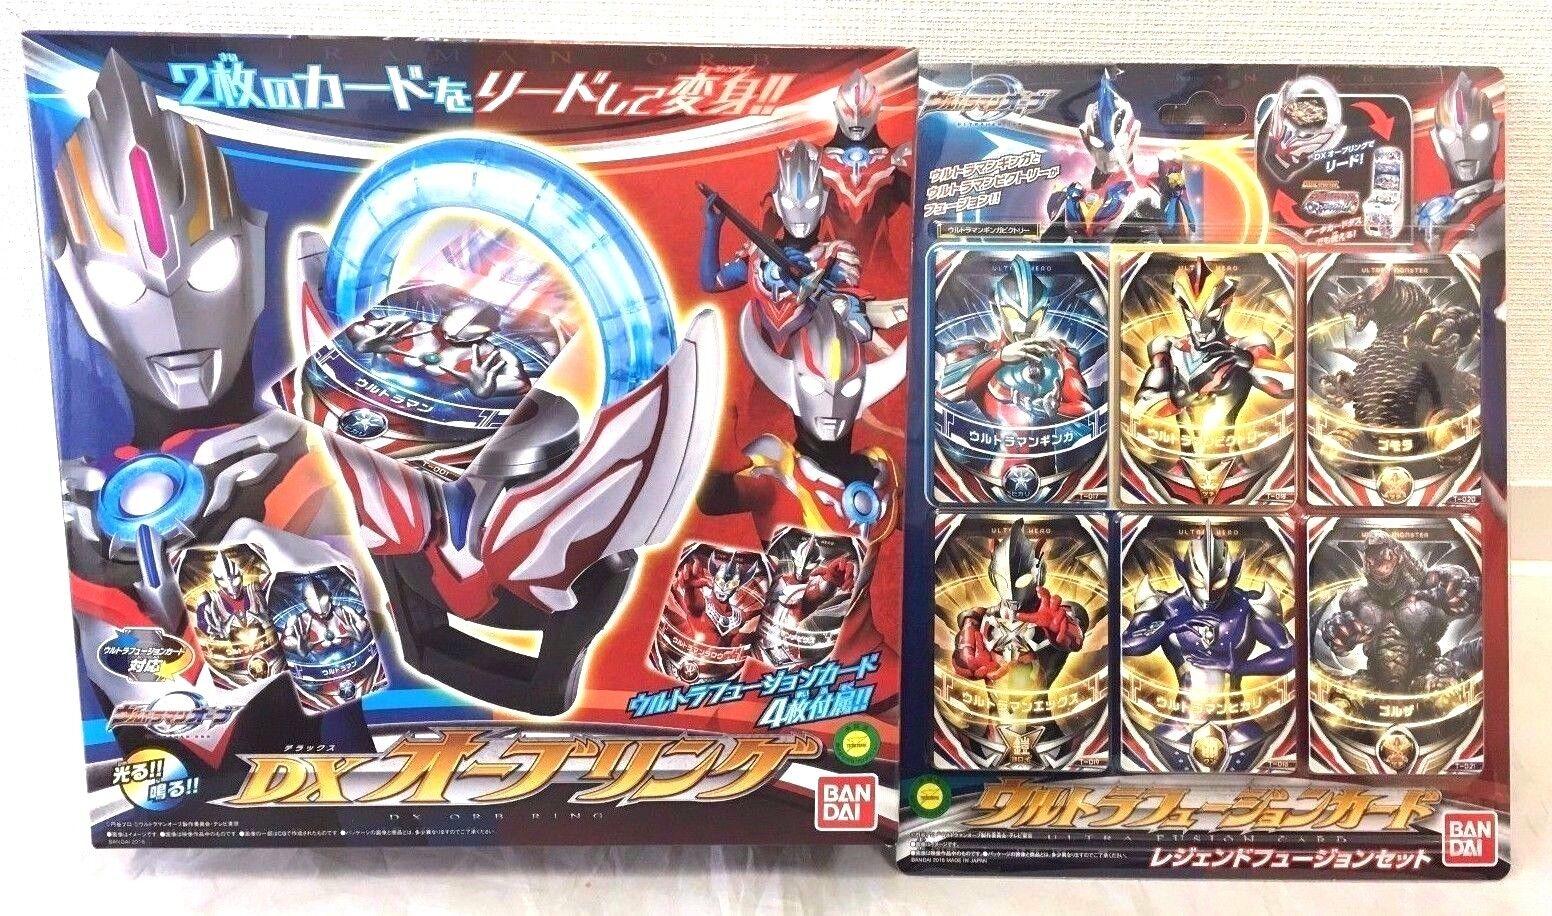 Bandai Ultraman Orb Dx Anello & Ultra Fusion Carta Leggenda Set Giappone Nuovo